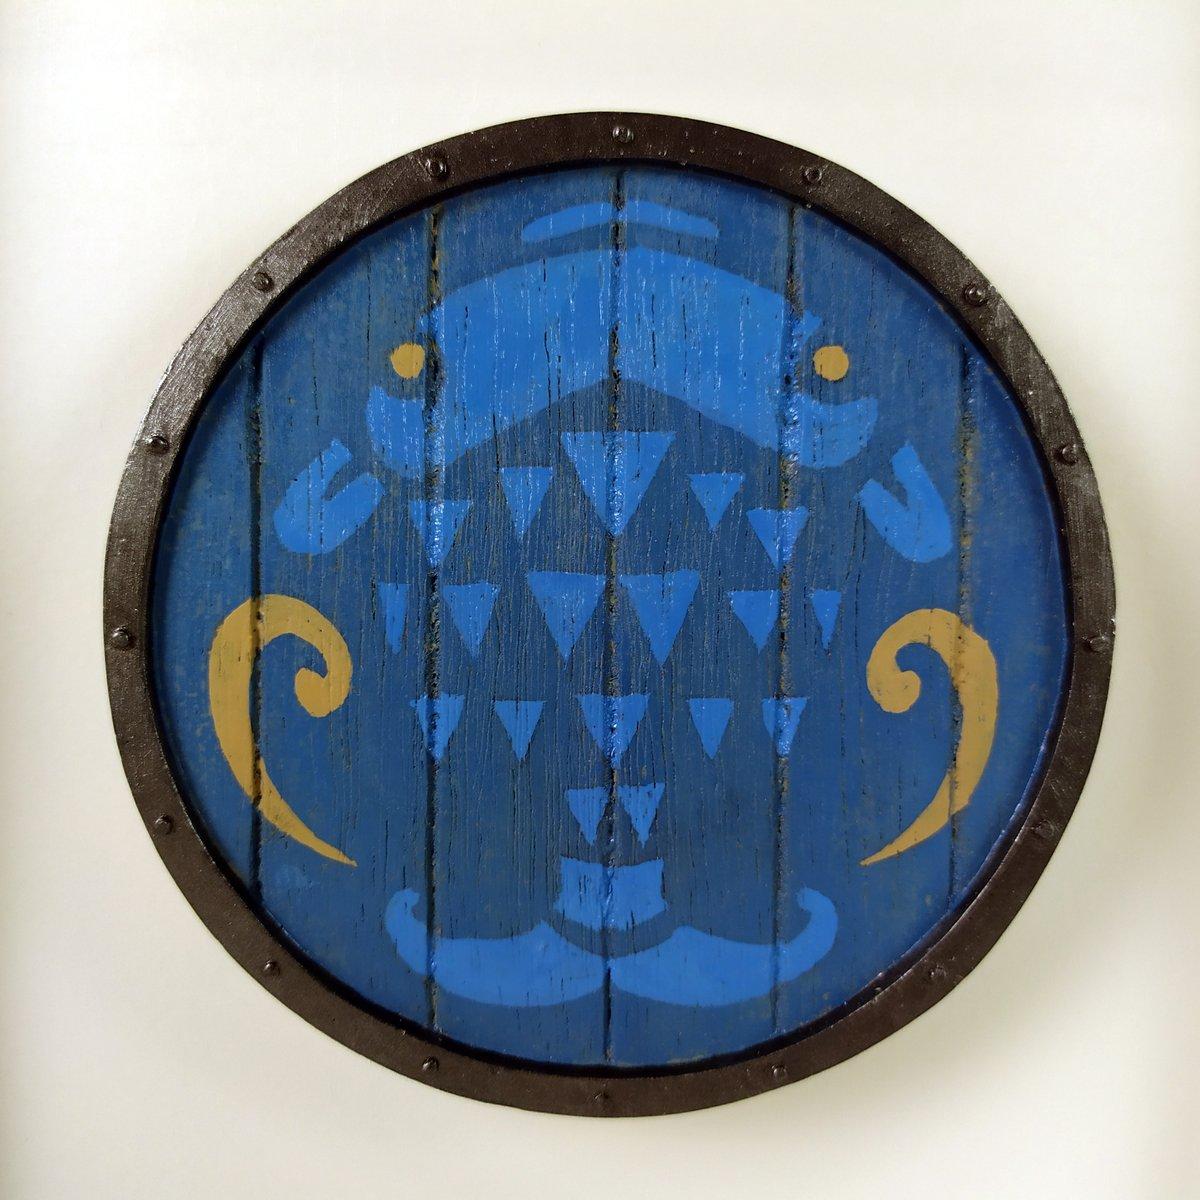 Image of Shields Zelda Breath Of The Wild - Fisherman's Shield